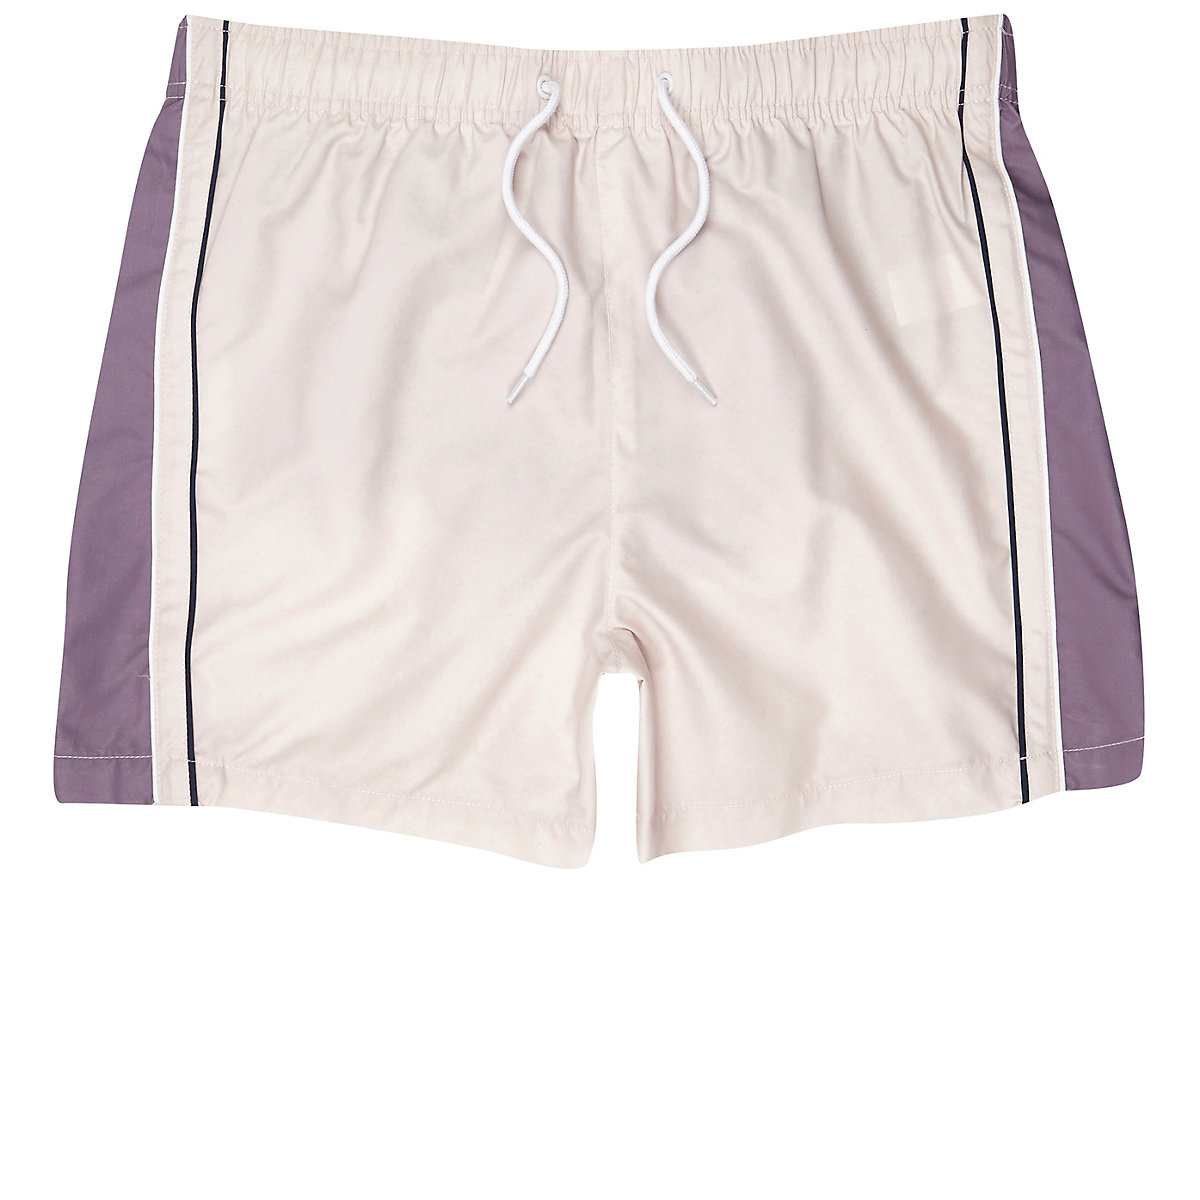 Light pink blocked stripe swim shorts